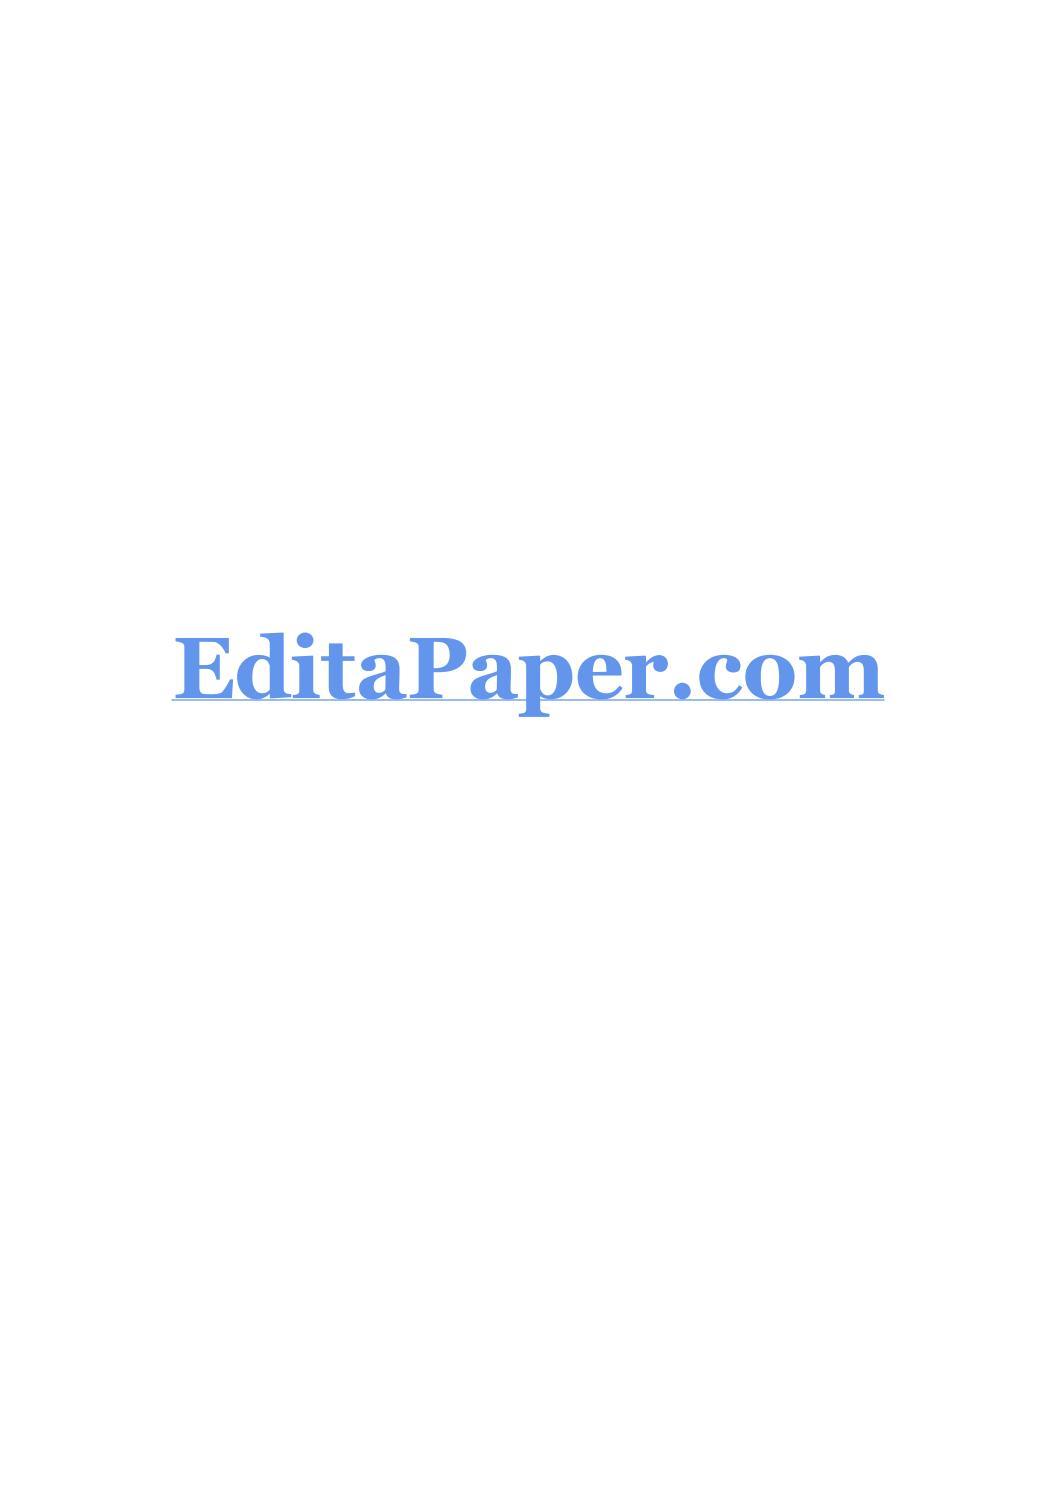 Essay writing services ottawa